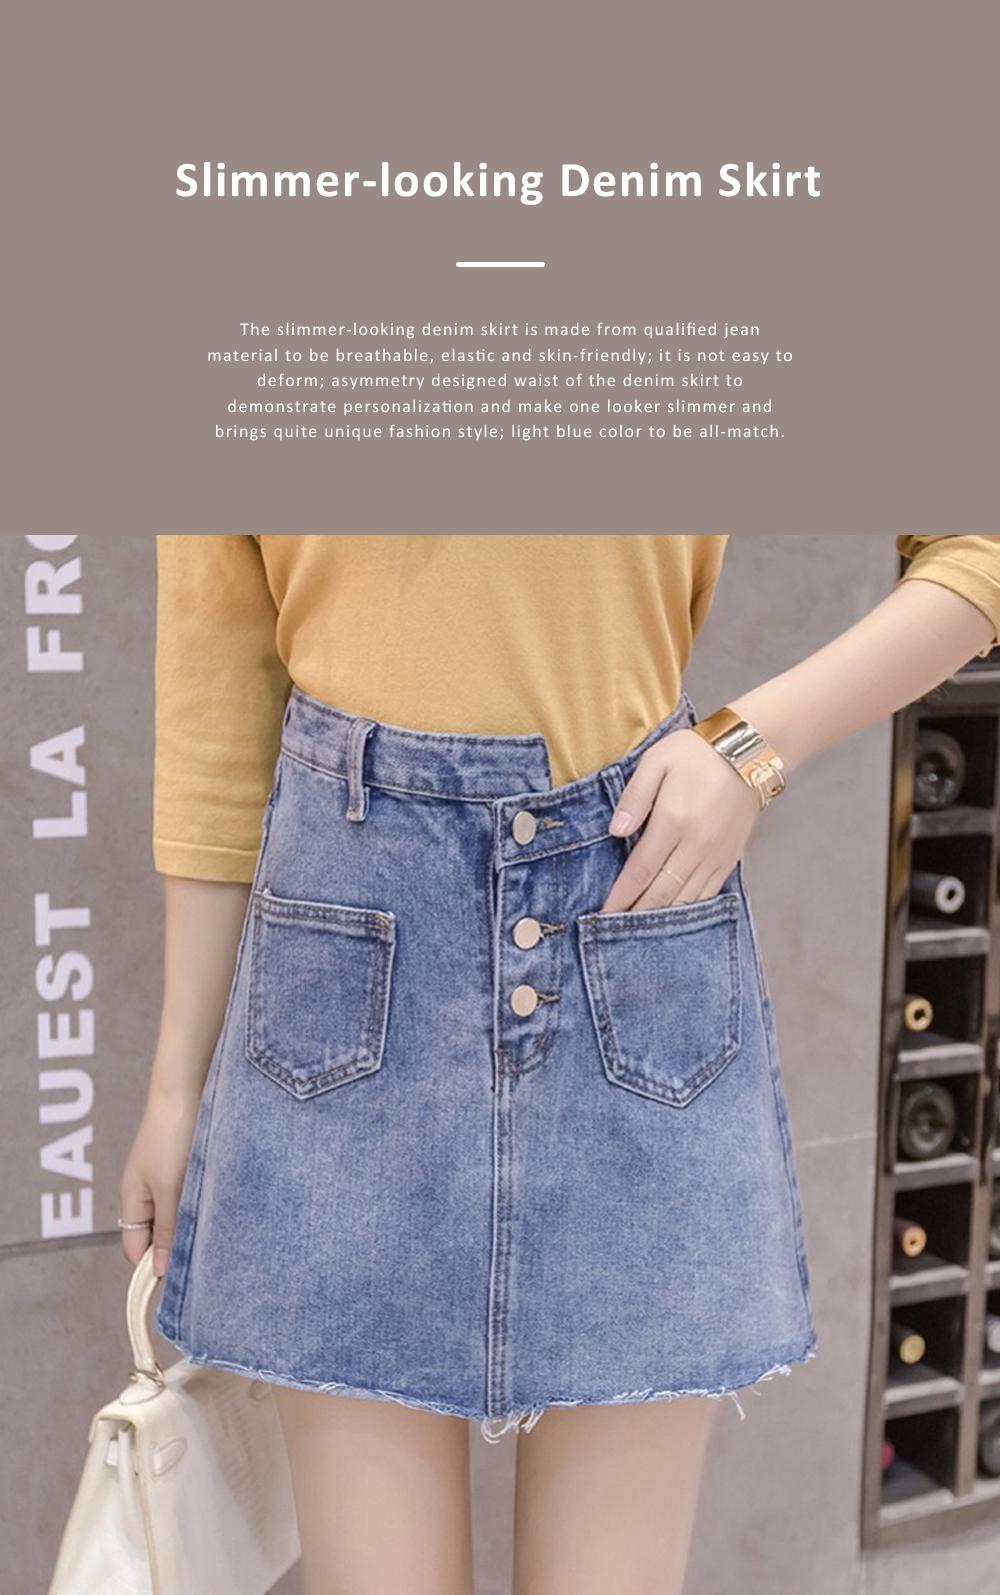 Close-fitting Irregular Denim Skirt for Women in Summer High-waisted Slimmer-looking Sheath Dress Hairy Brim Jean Midskirt Women Dress 0